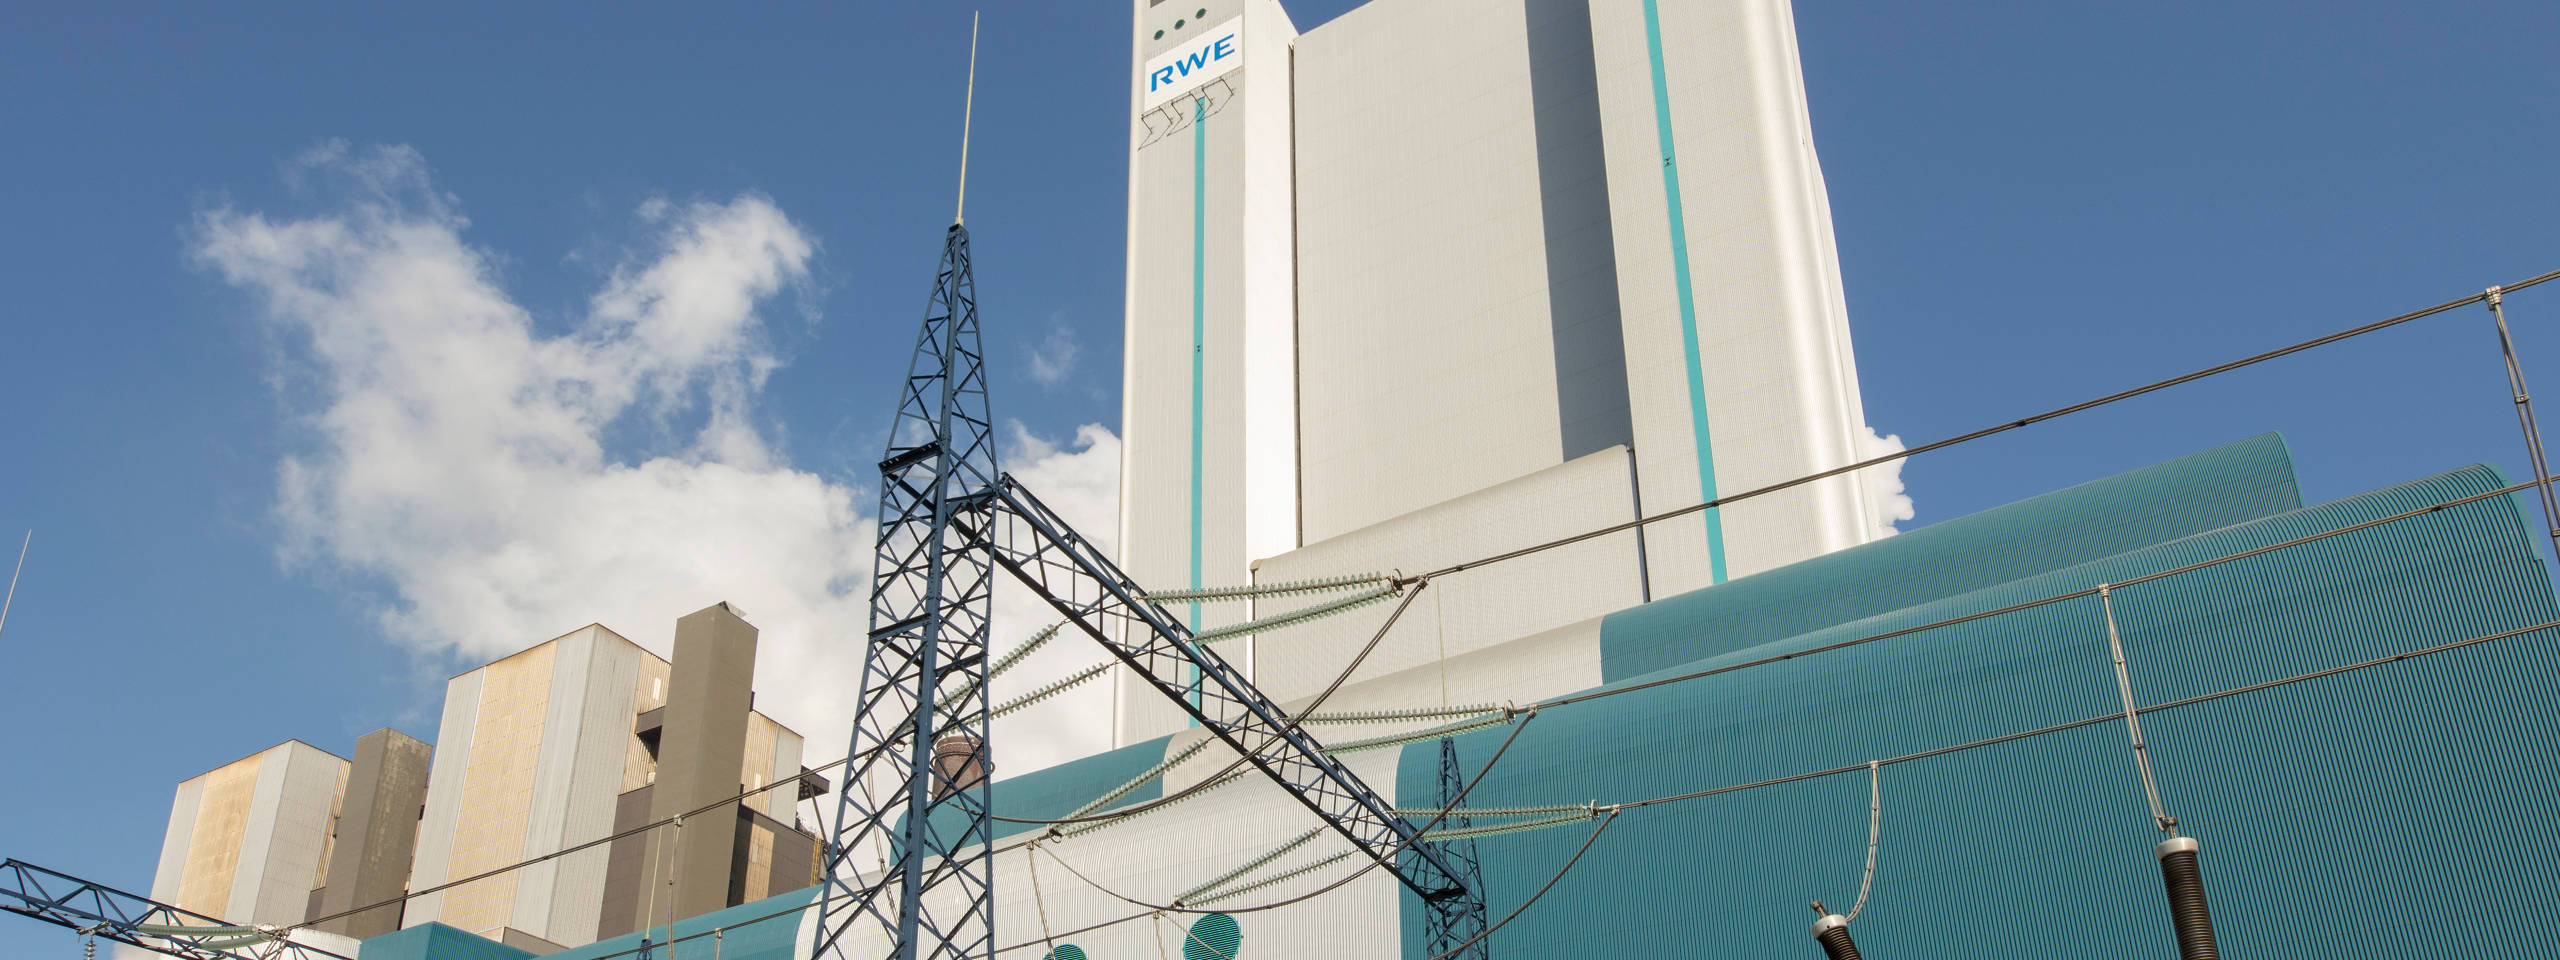 Niederaussem power plant